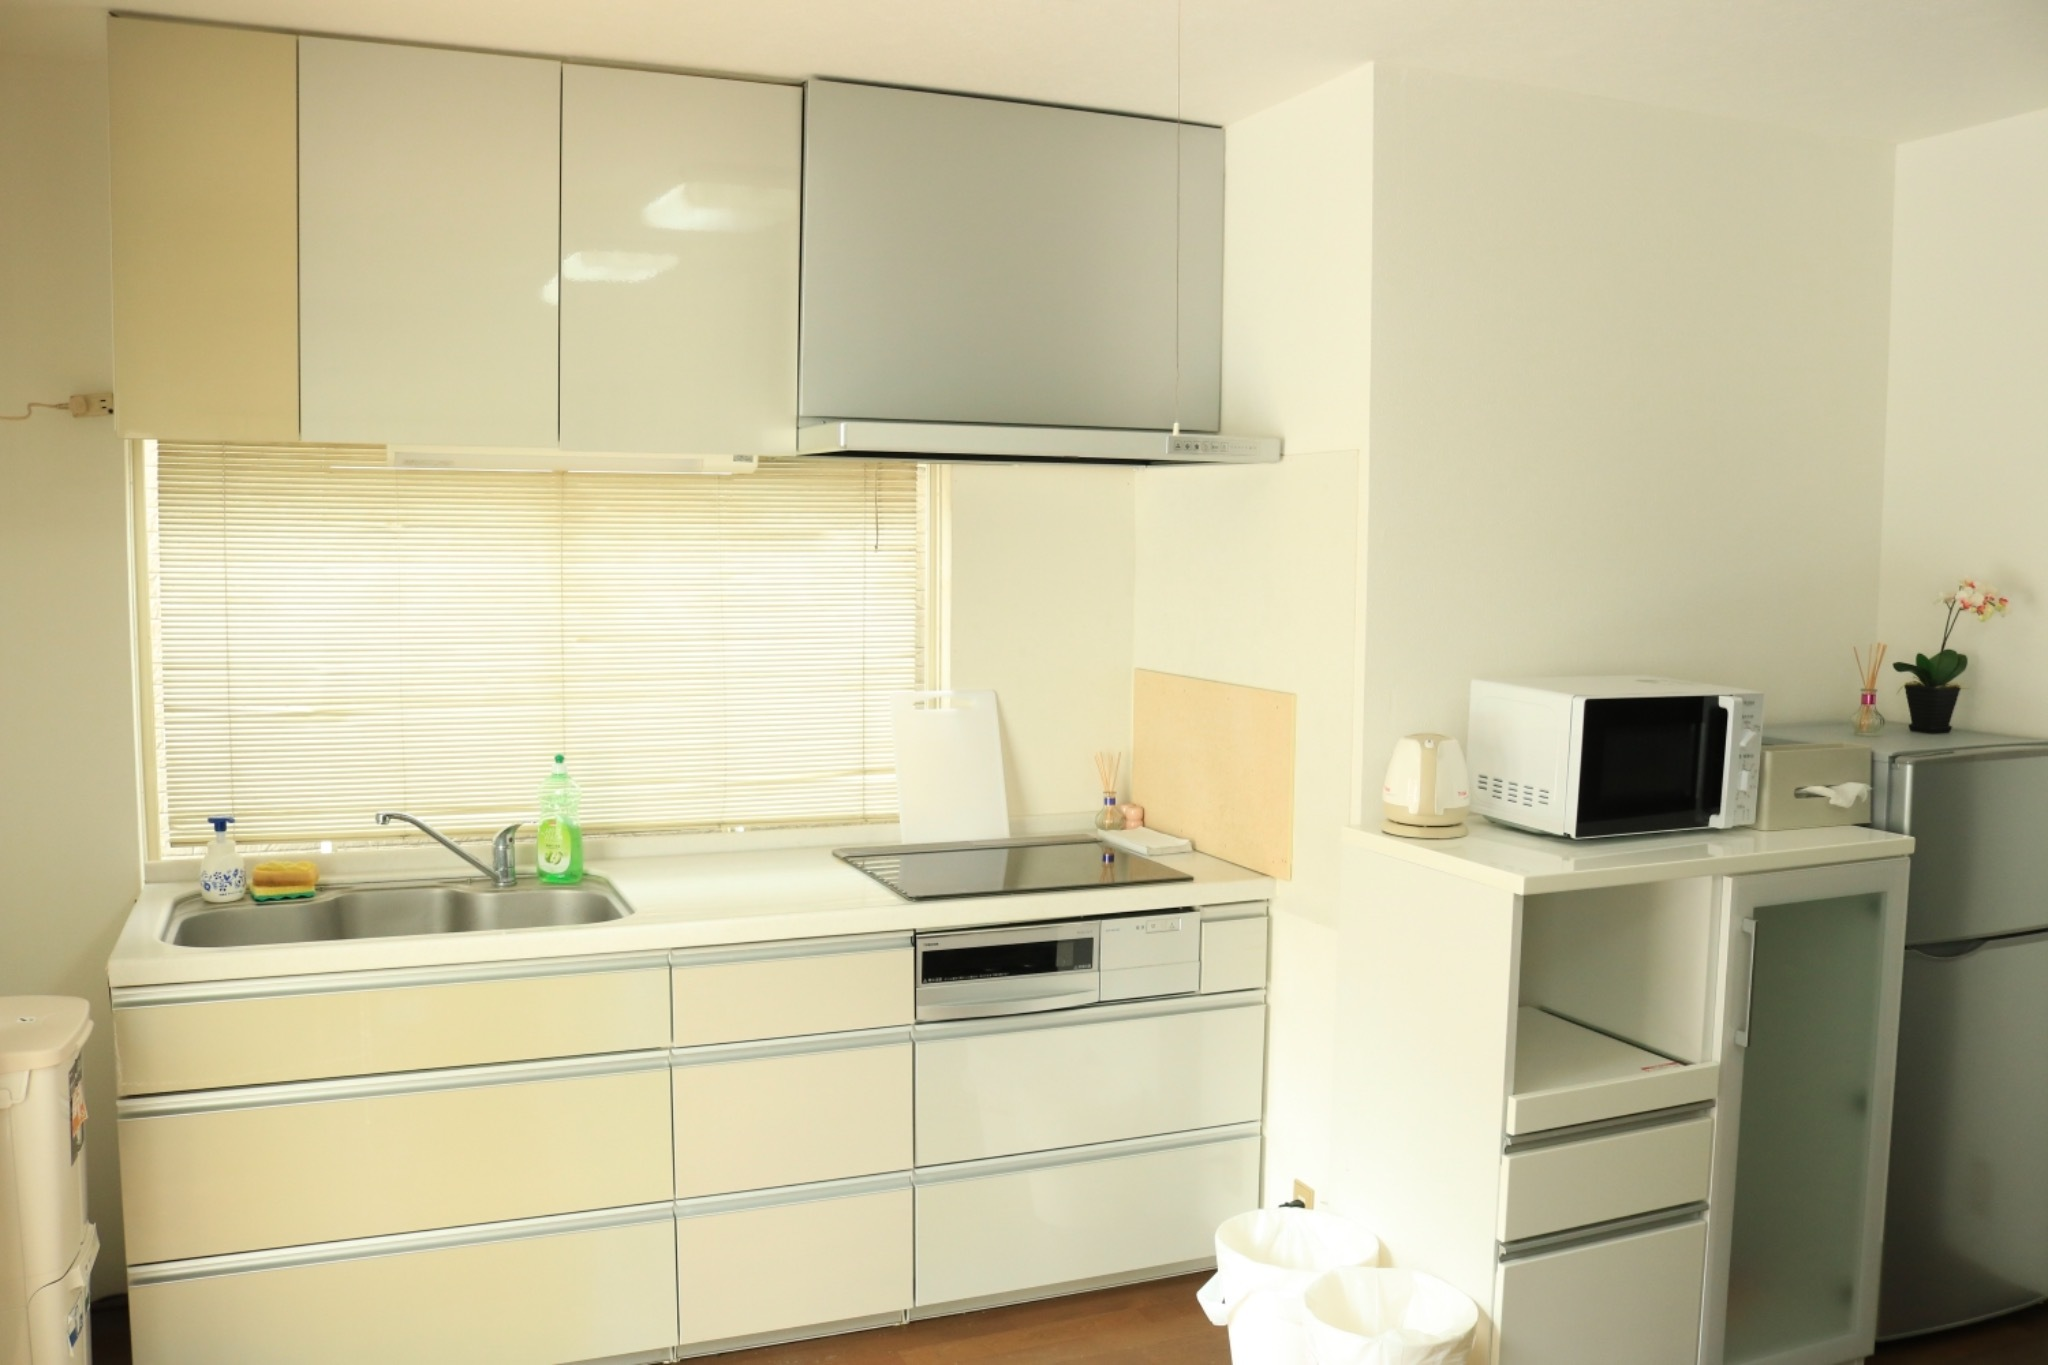 2LDK貸切 / WiFi完備 / 駐車場付 / 徳島市内繁華街のベストロケーション一軒家!(部屋)